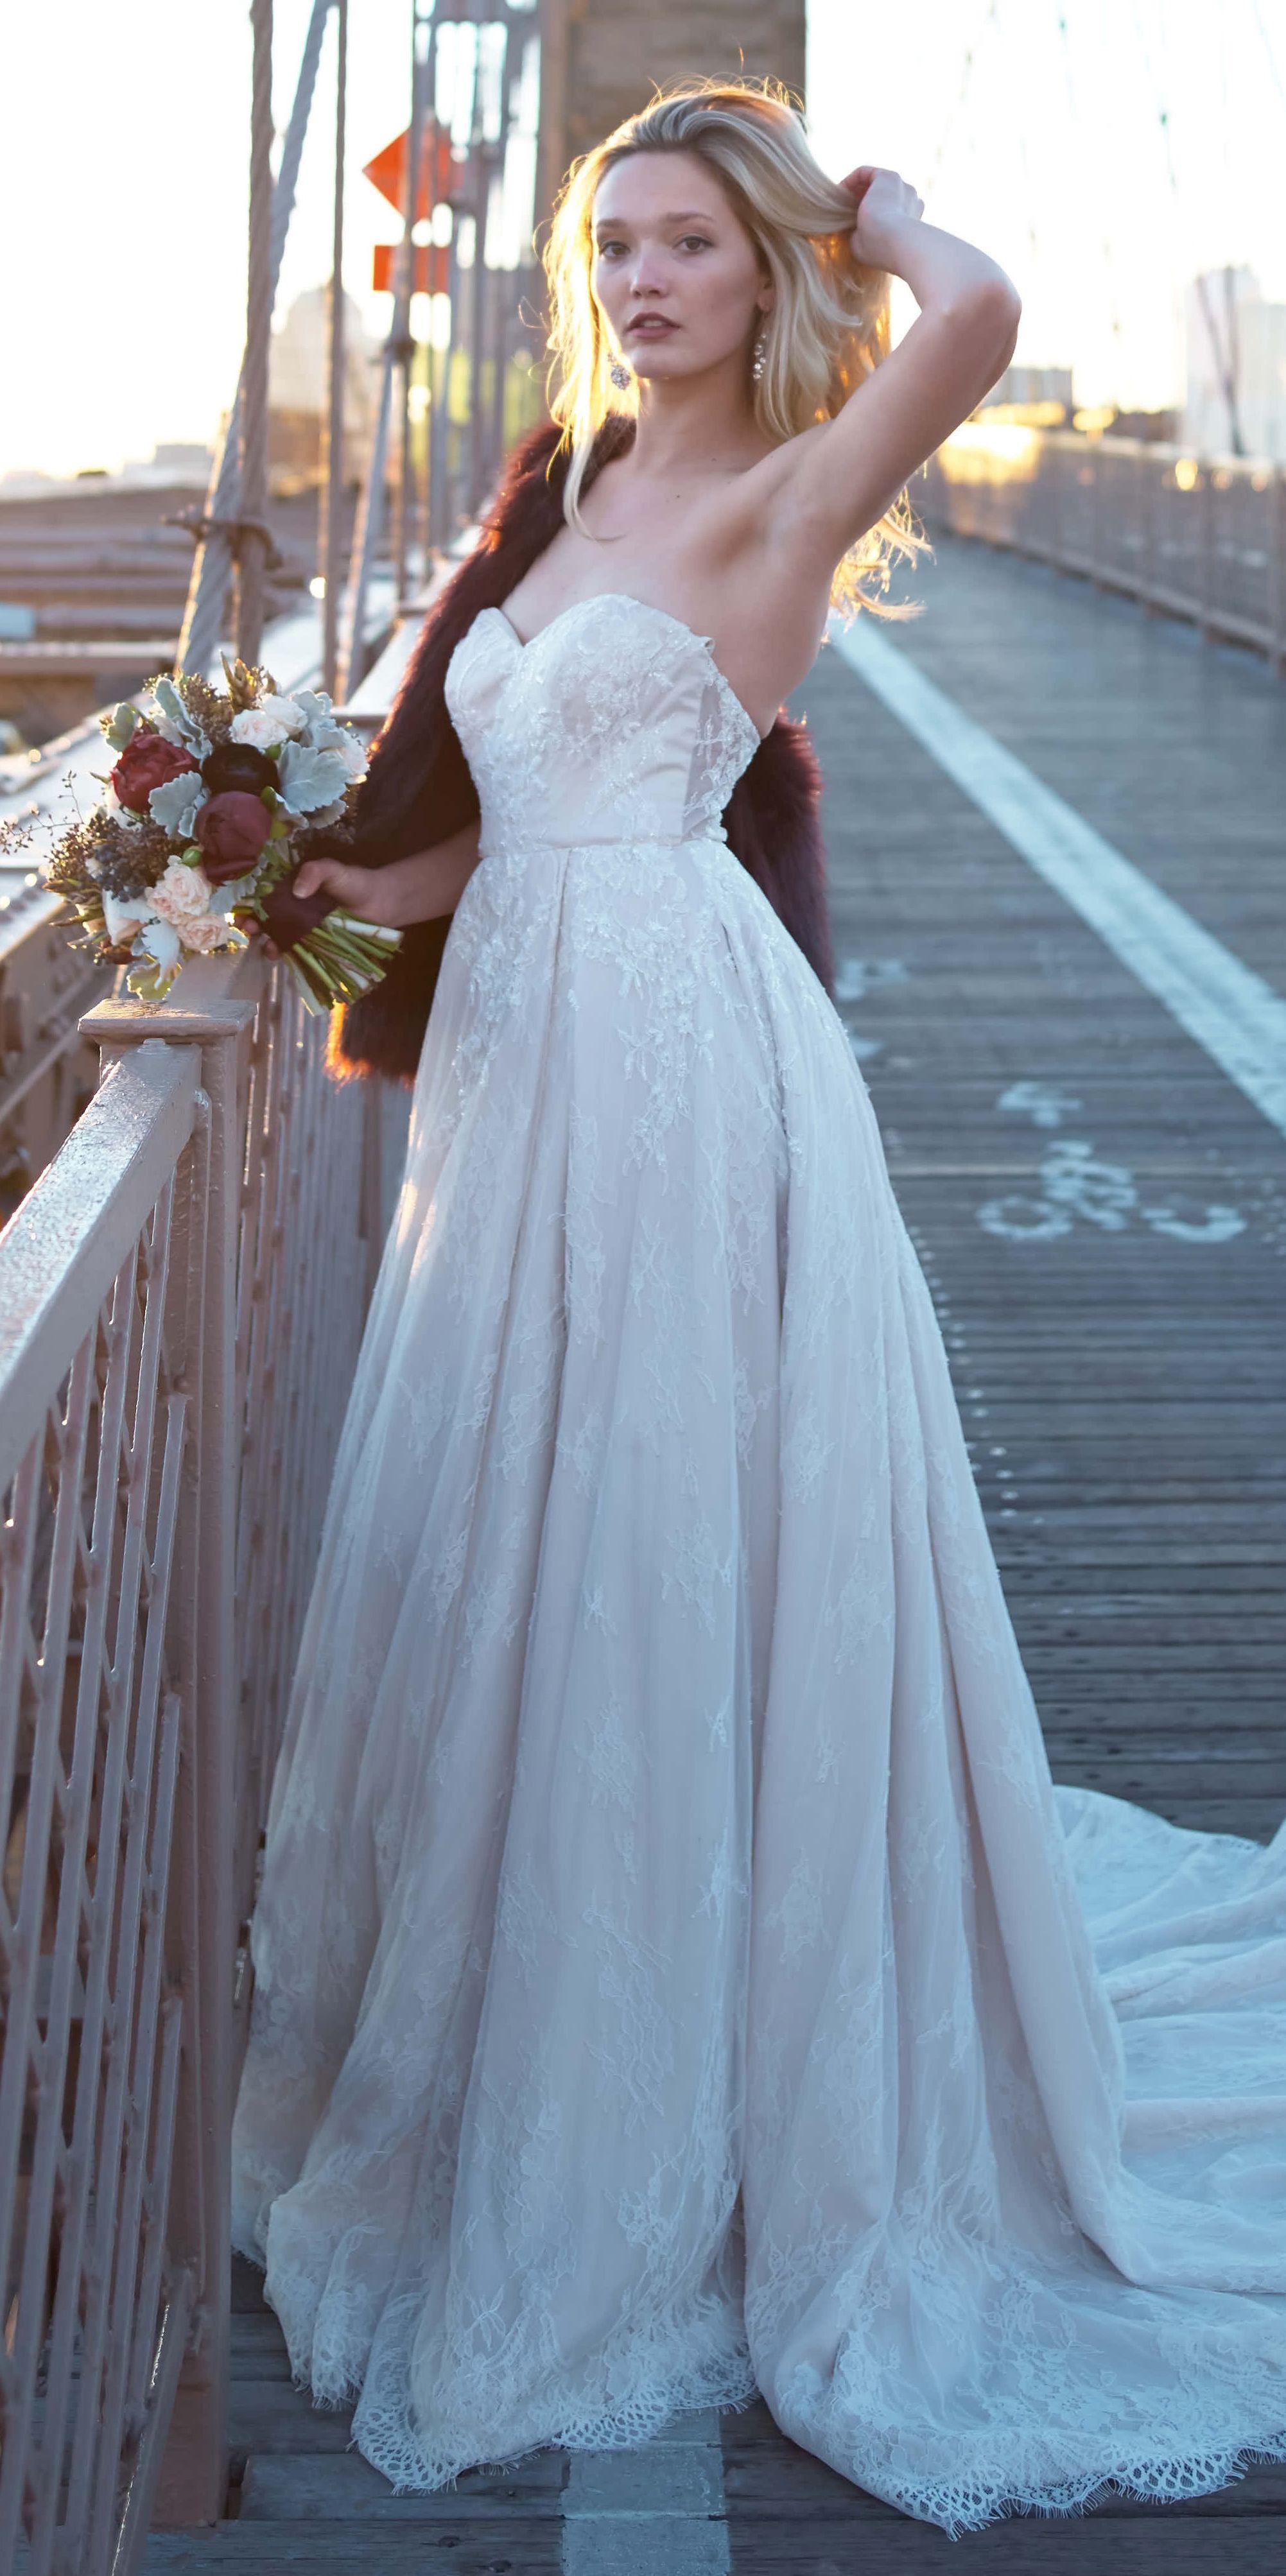 Winter wedding on the Brooklyn Bridge! Shimmer lace wedding dress ...